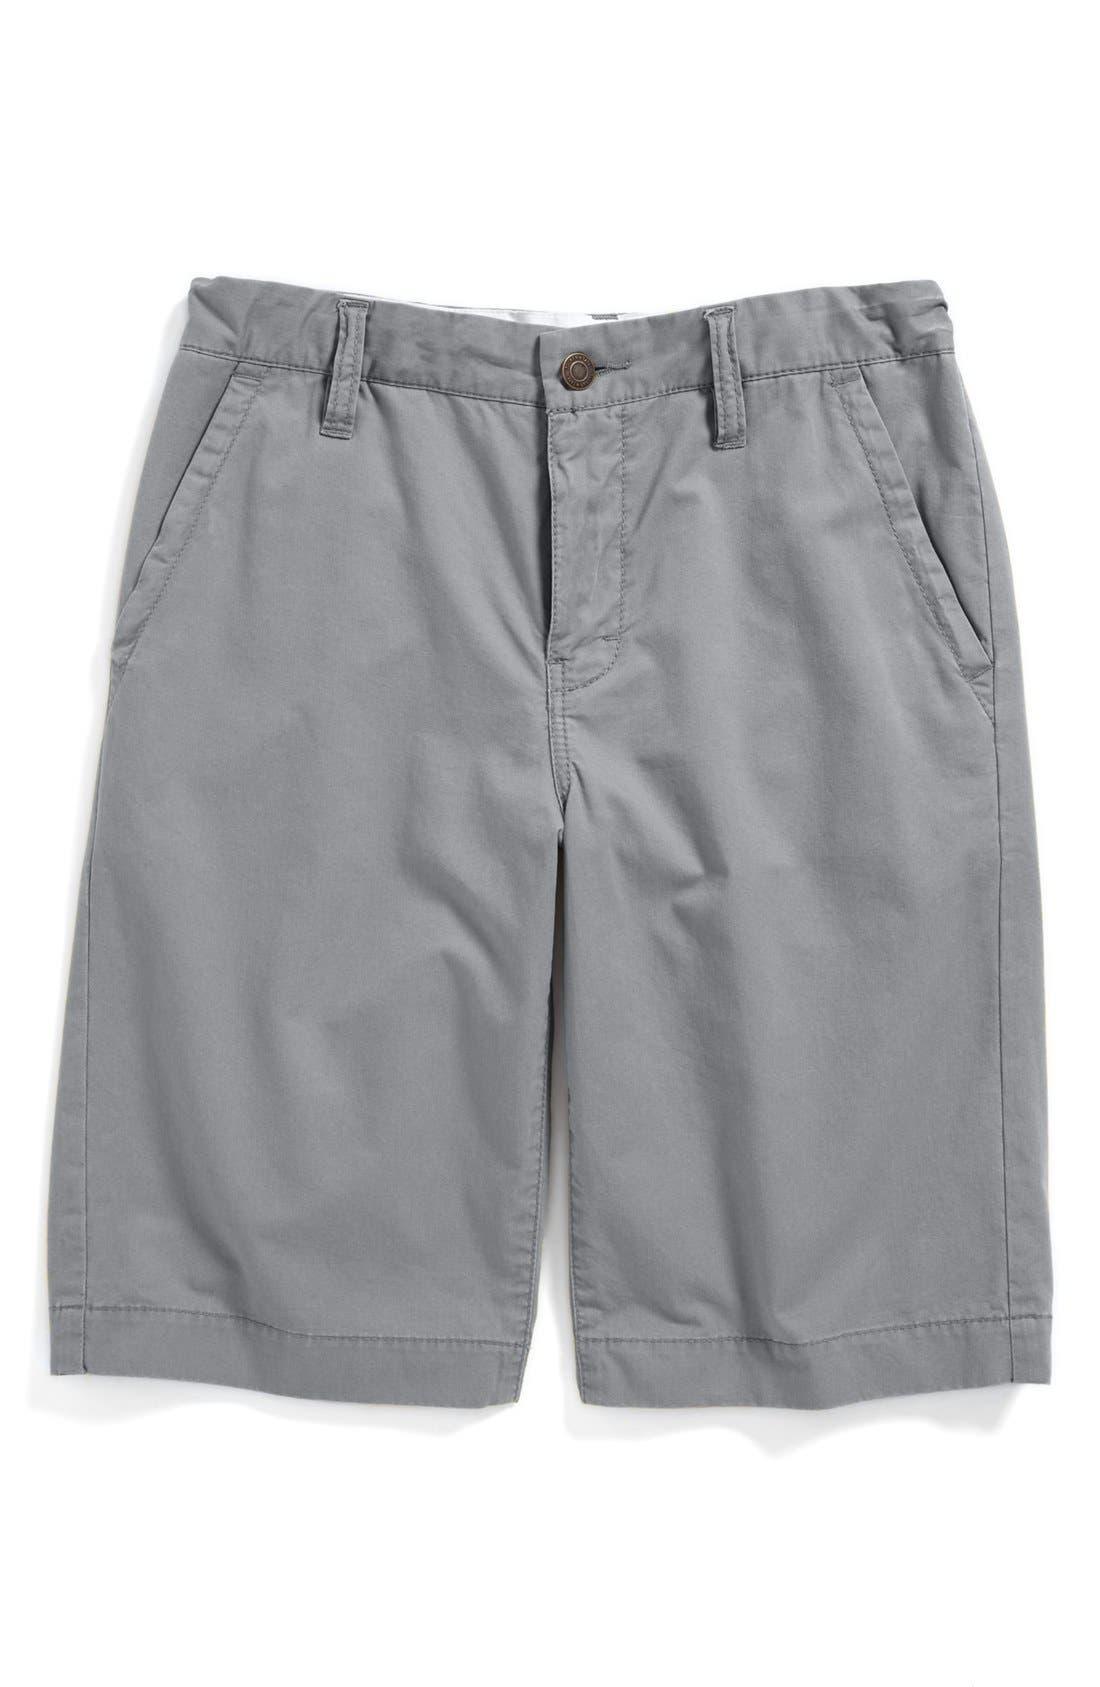 Alternate Image 1 Selected - Tucker + Tate 'Stunt' Chino Shorts (Toddler Boys, Little Boys & Big Boys)